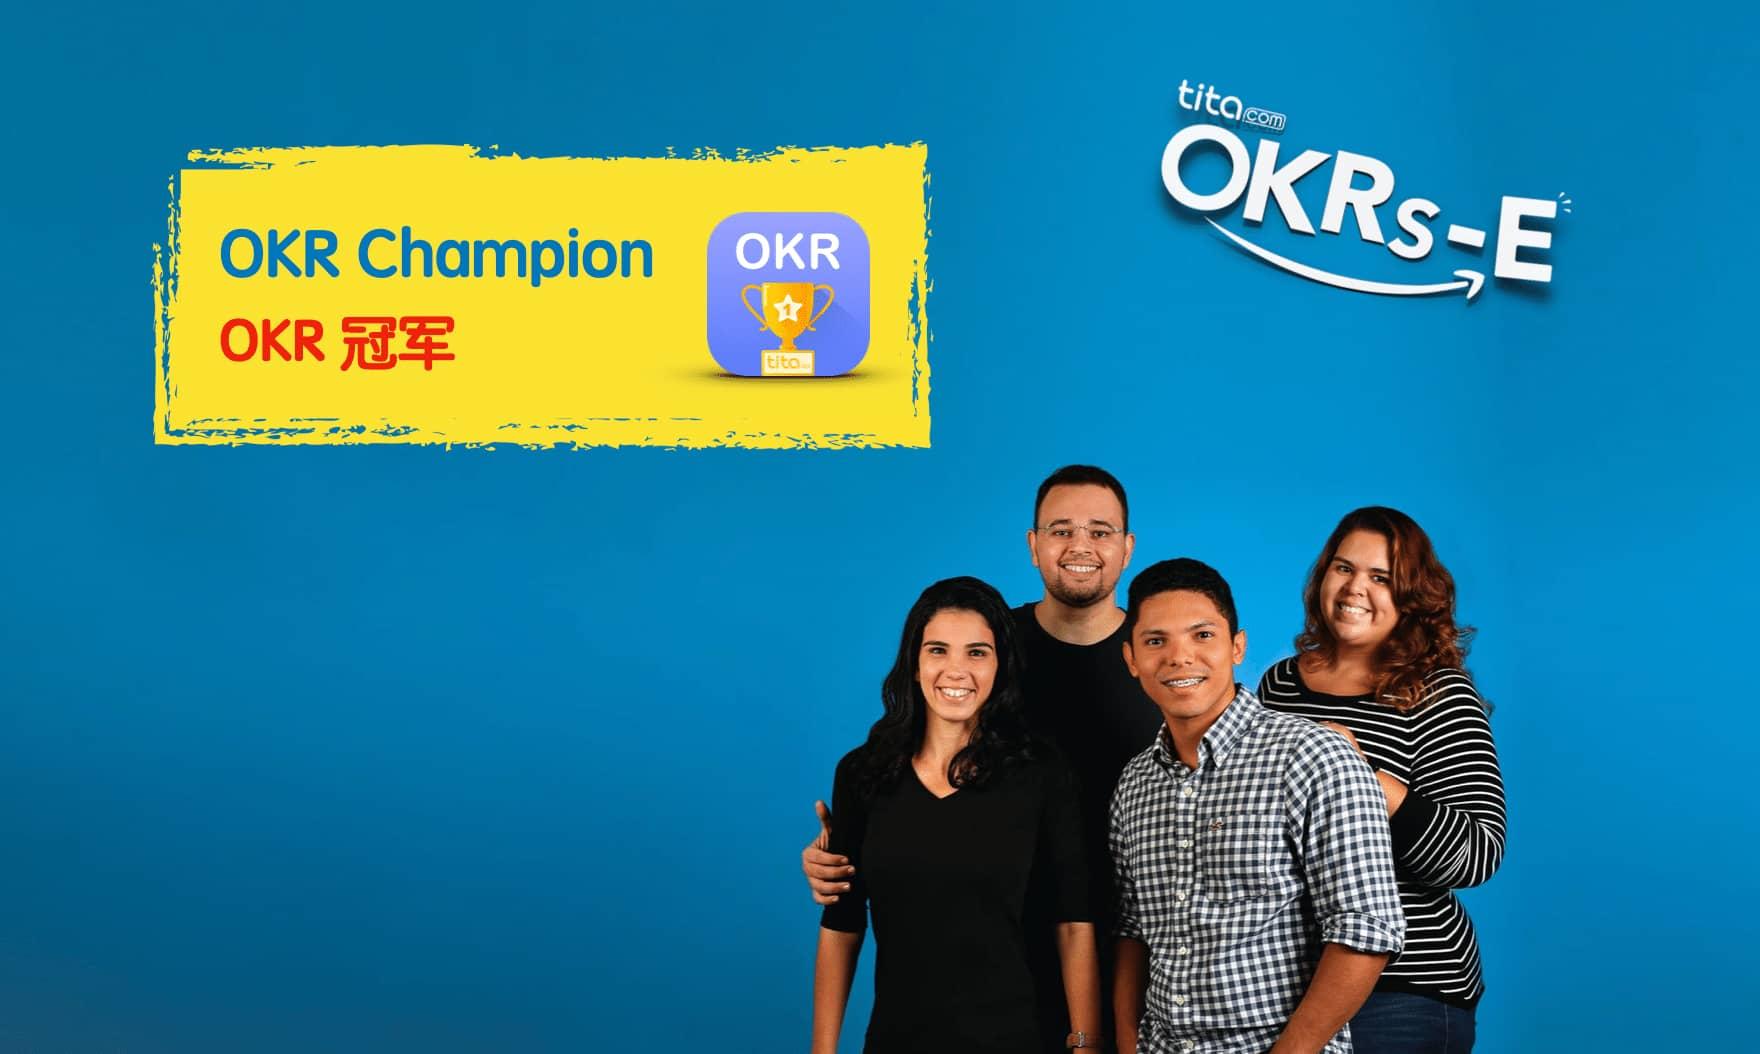 OKR冠军,企业OKR成功必备!